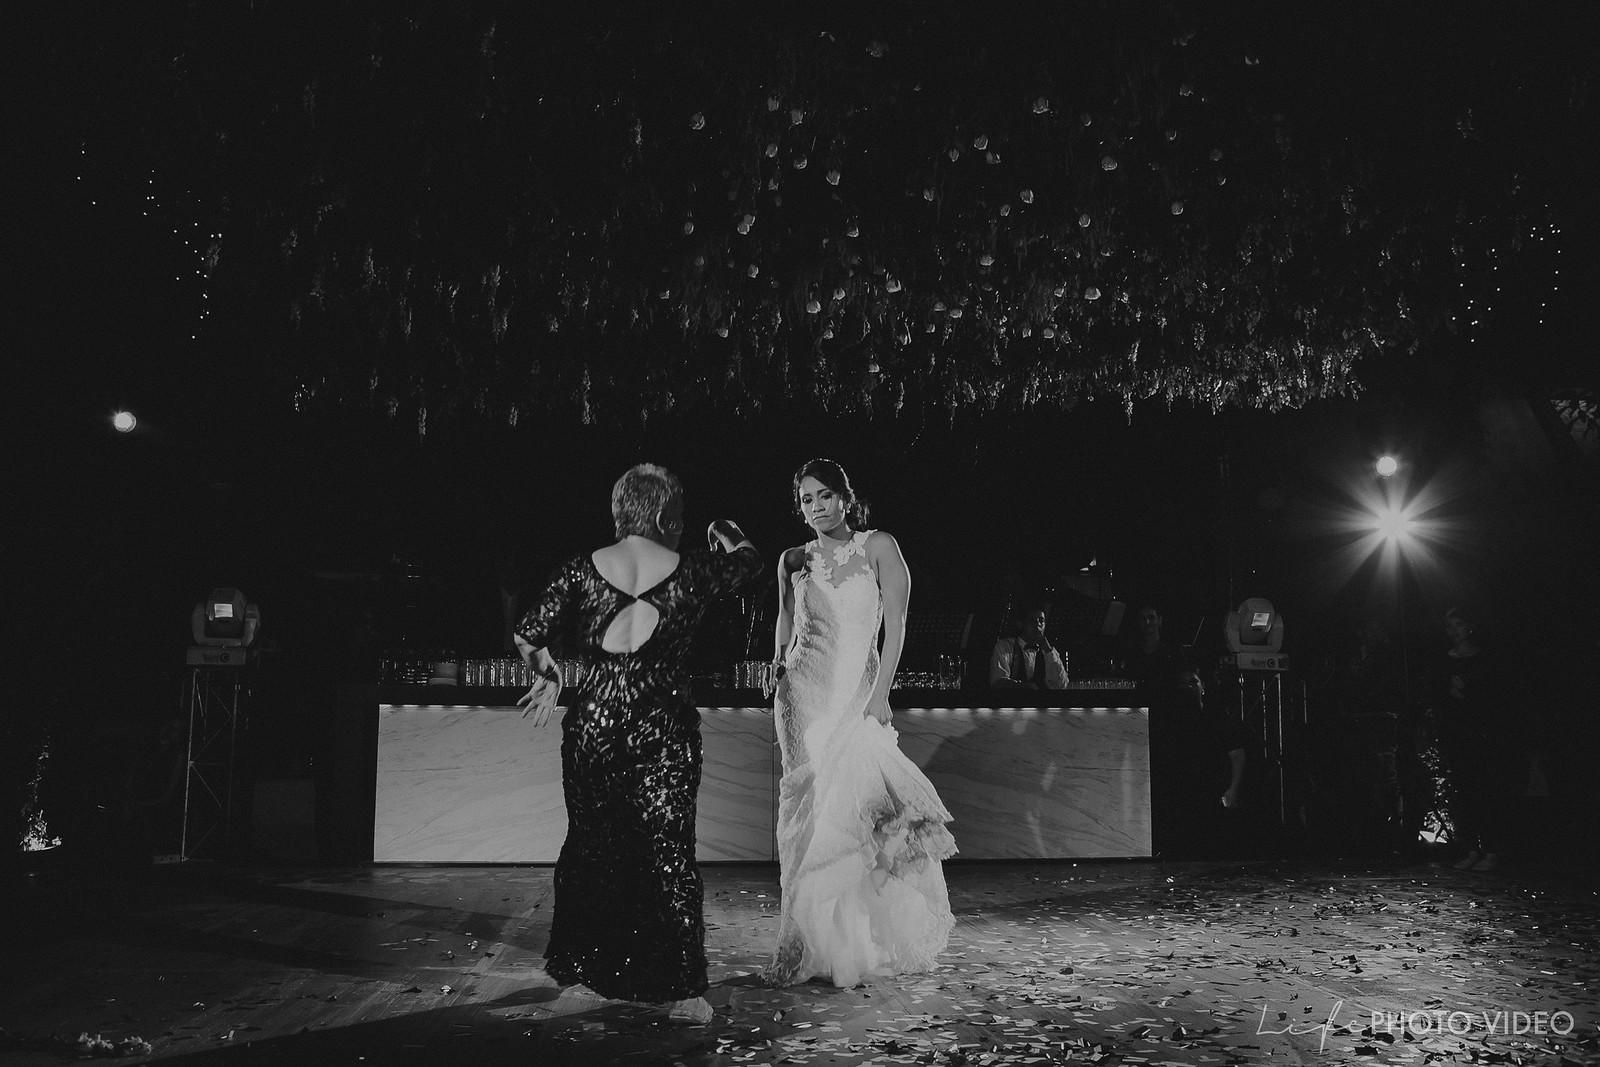 LifePhotoVideo_Boda_Guanajuato_Wedding_0061